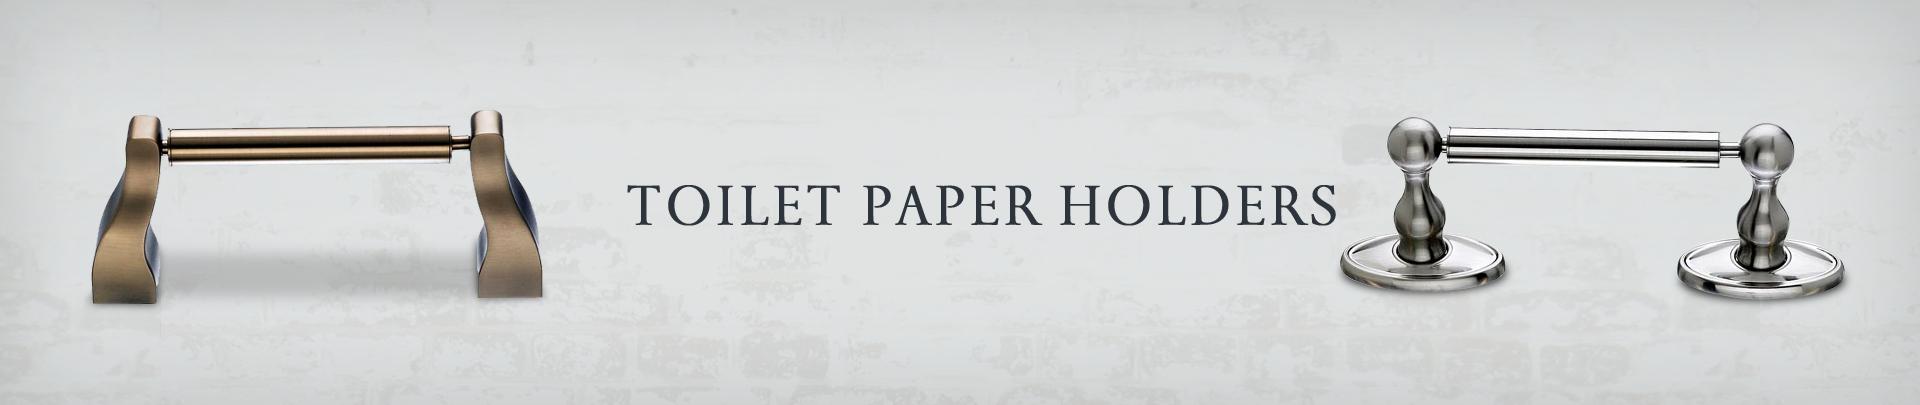 bath-toilet-paper-holders.png